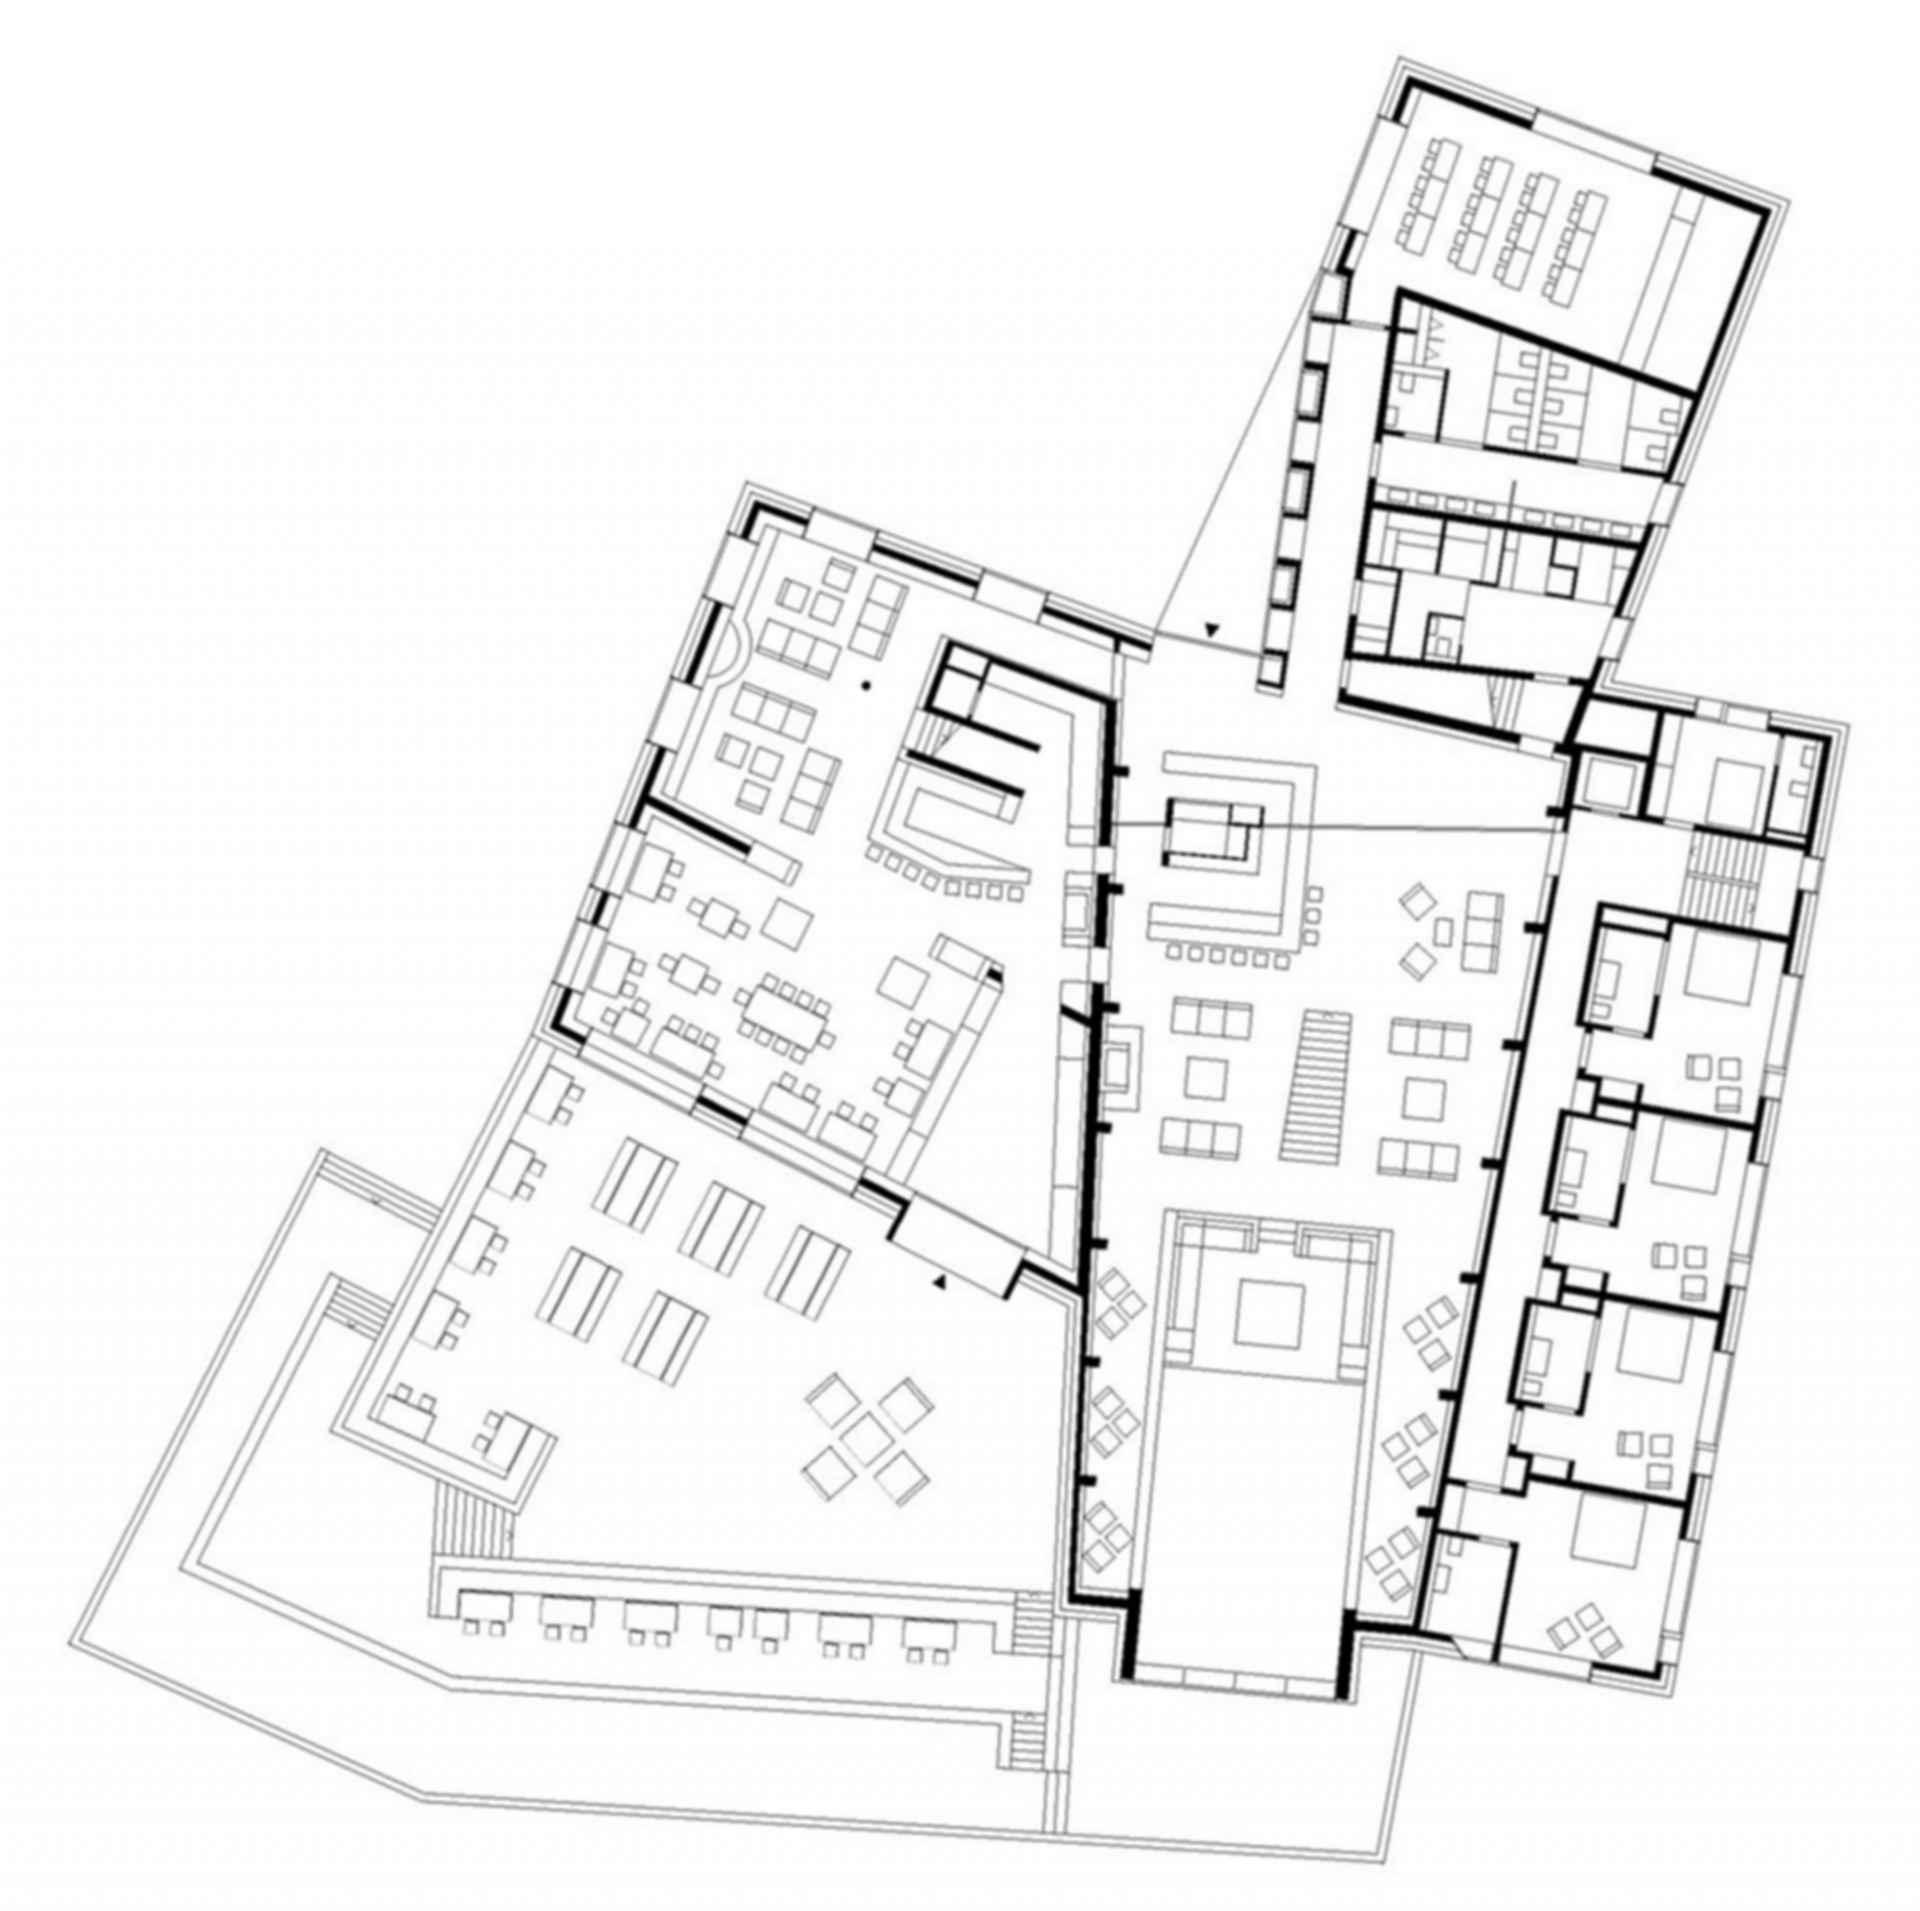 Chetzeron Hotel - floor plan